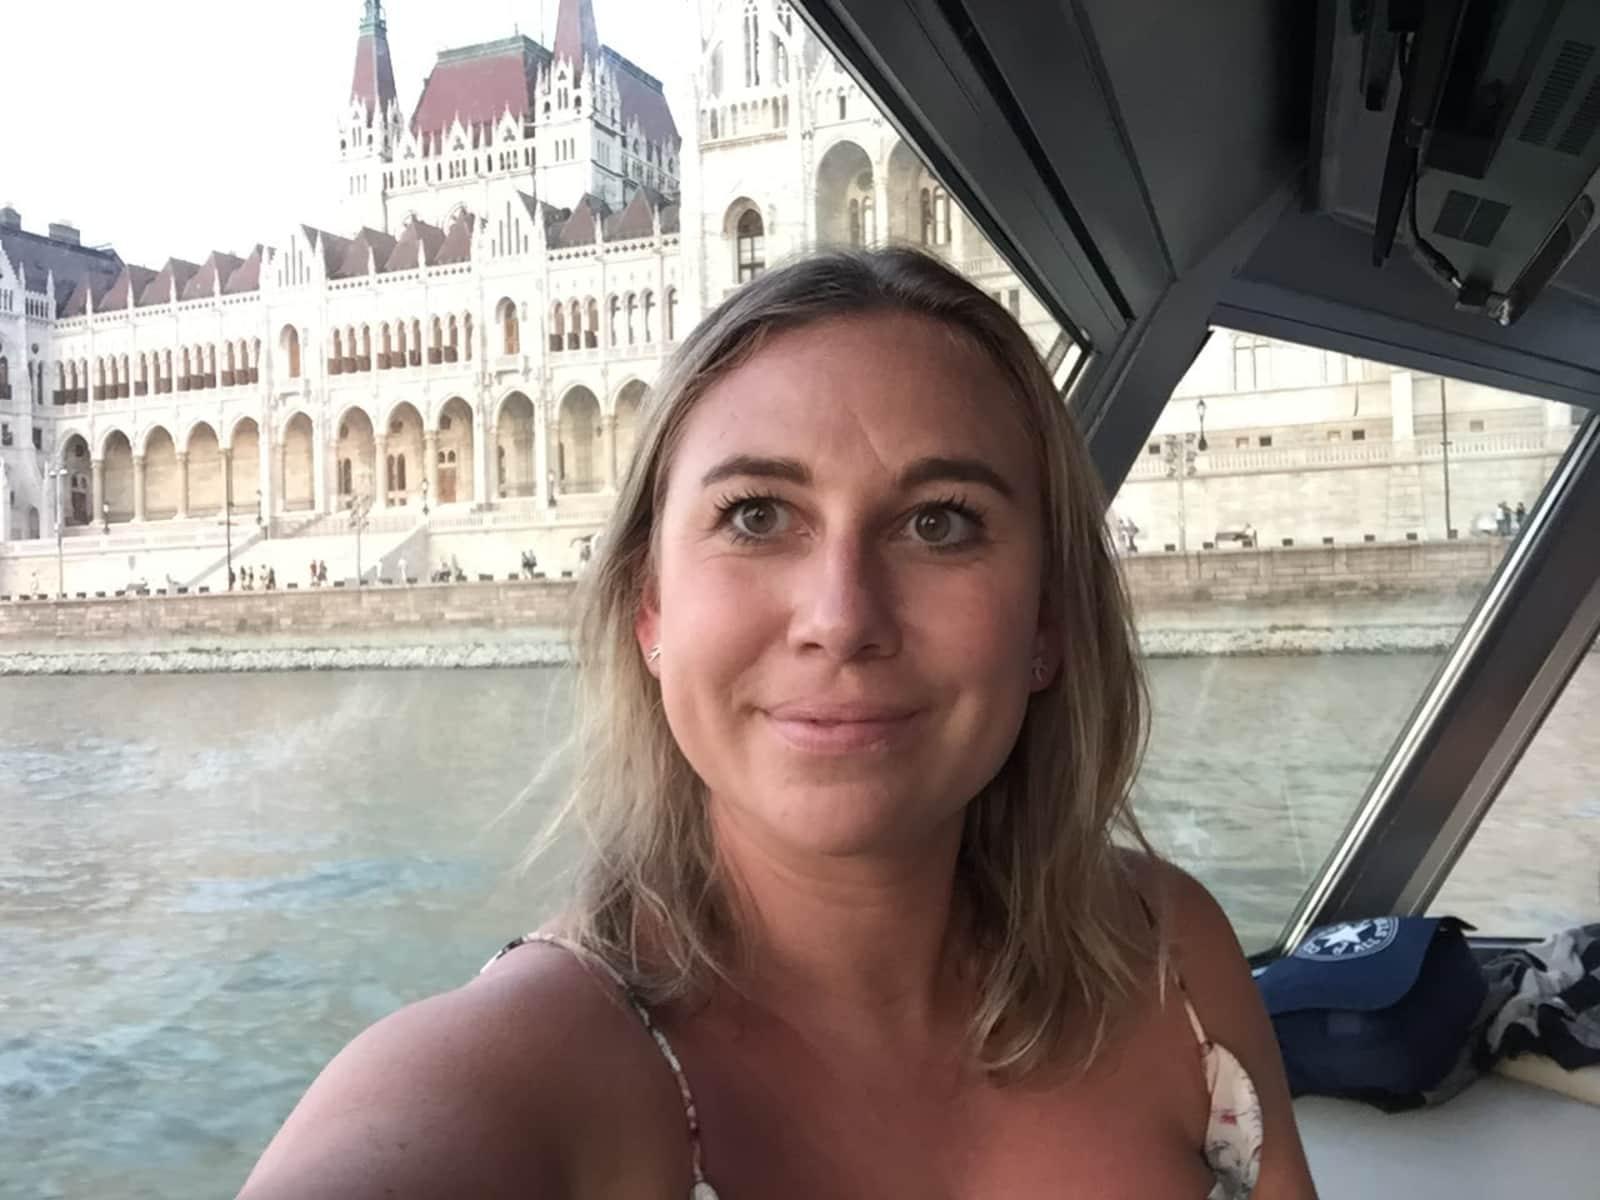 Rebekah from London, United Kingdom